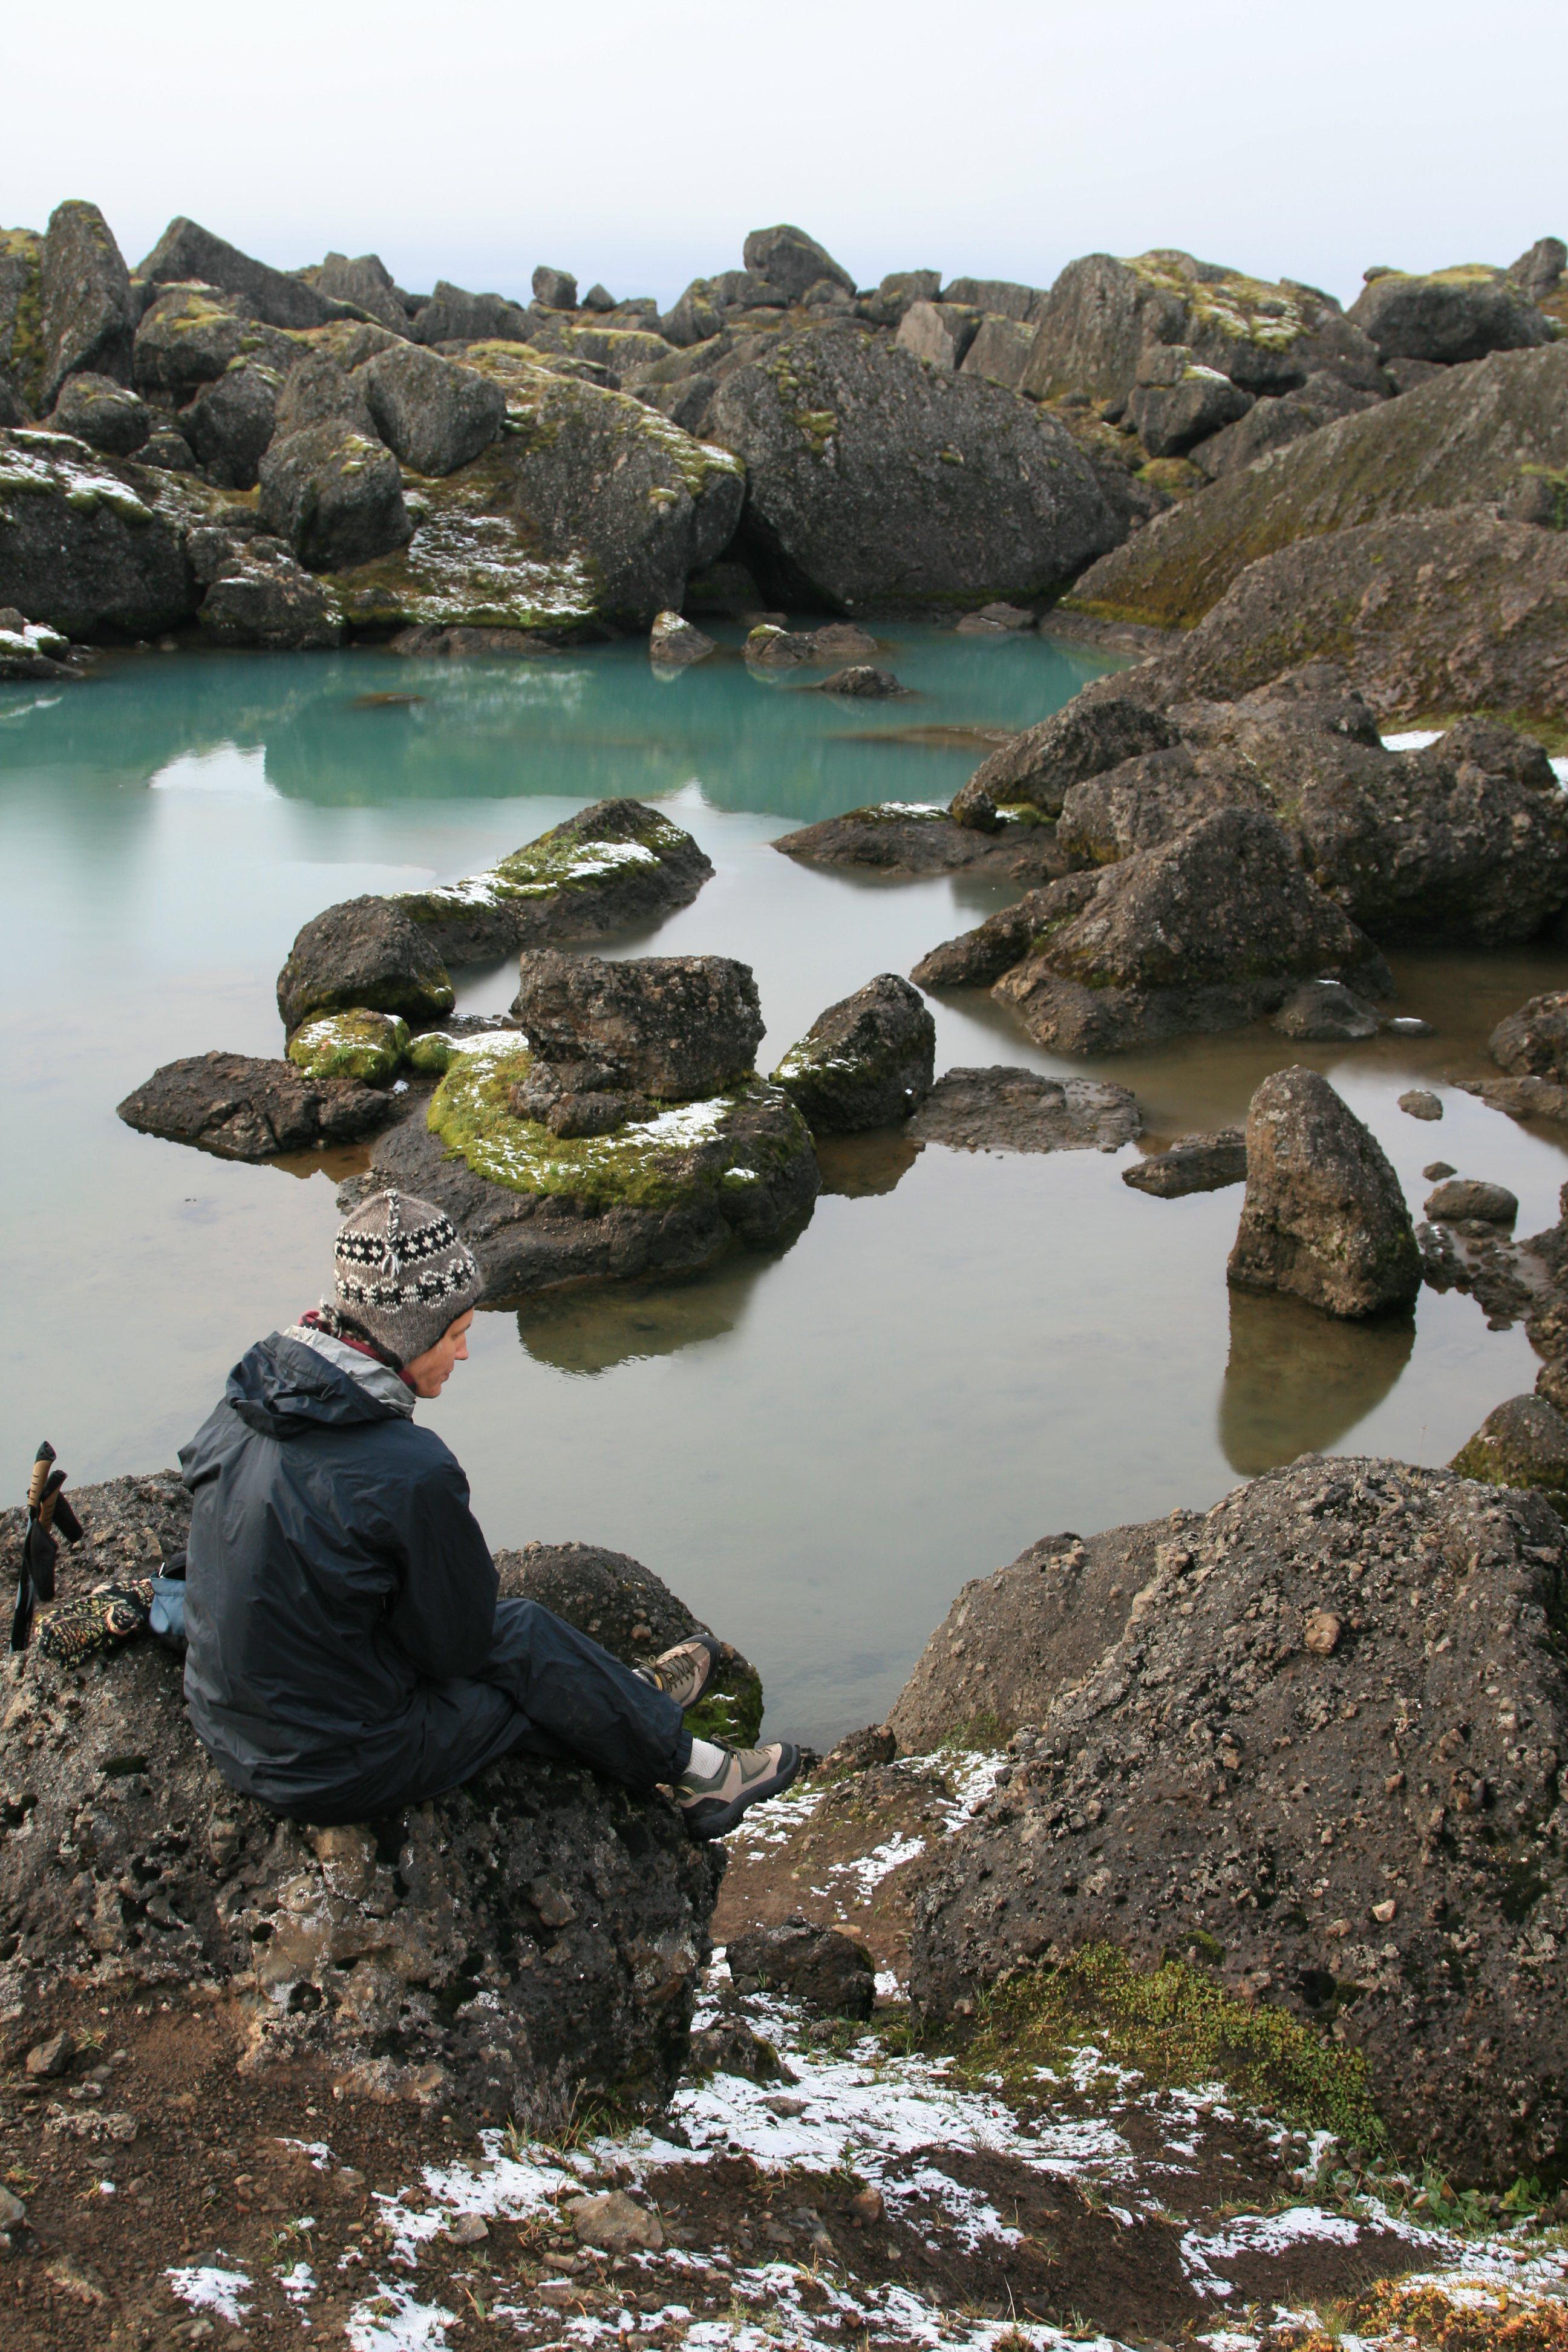 The rocky surface of Stórurð hiking trail.